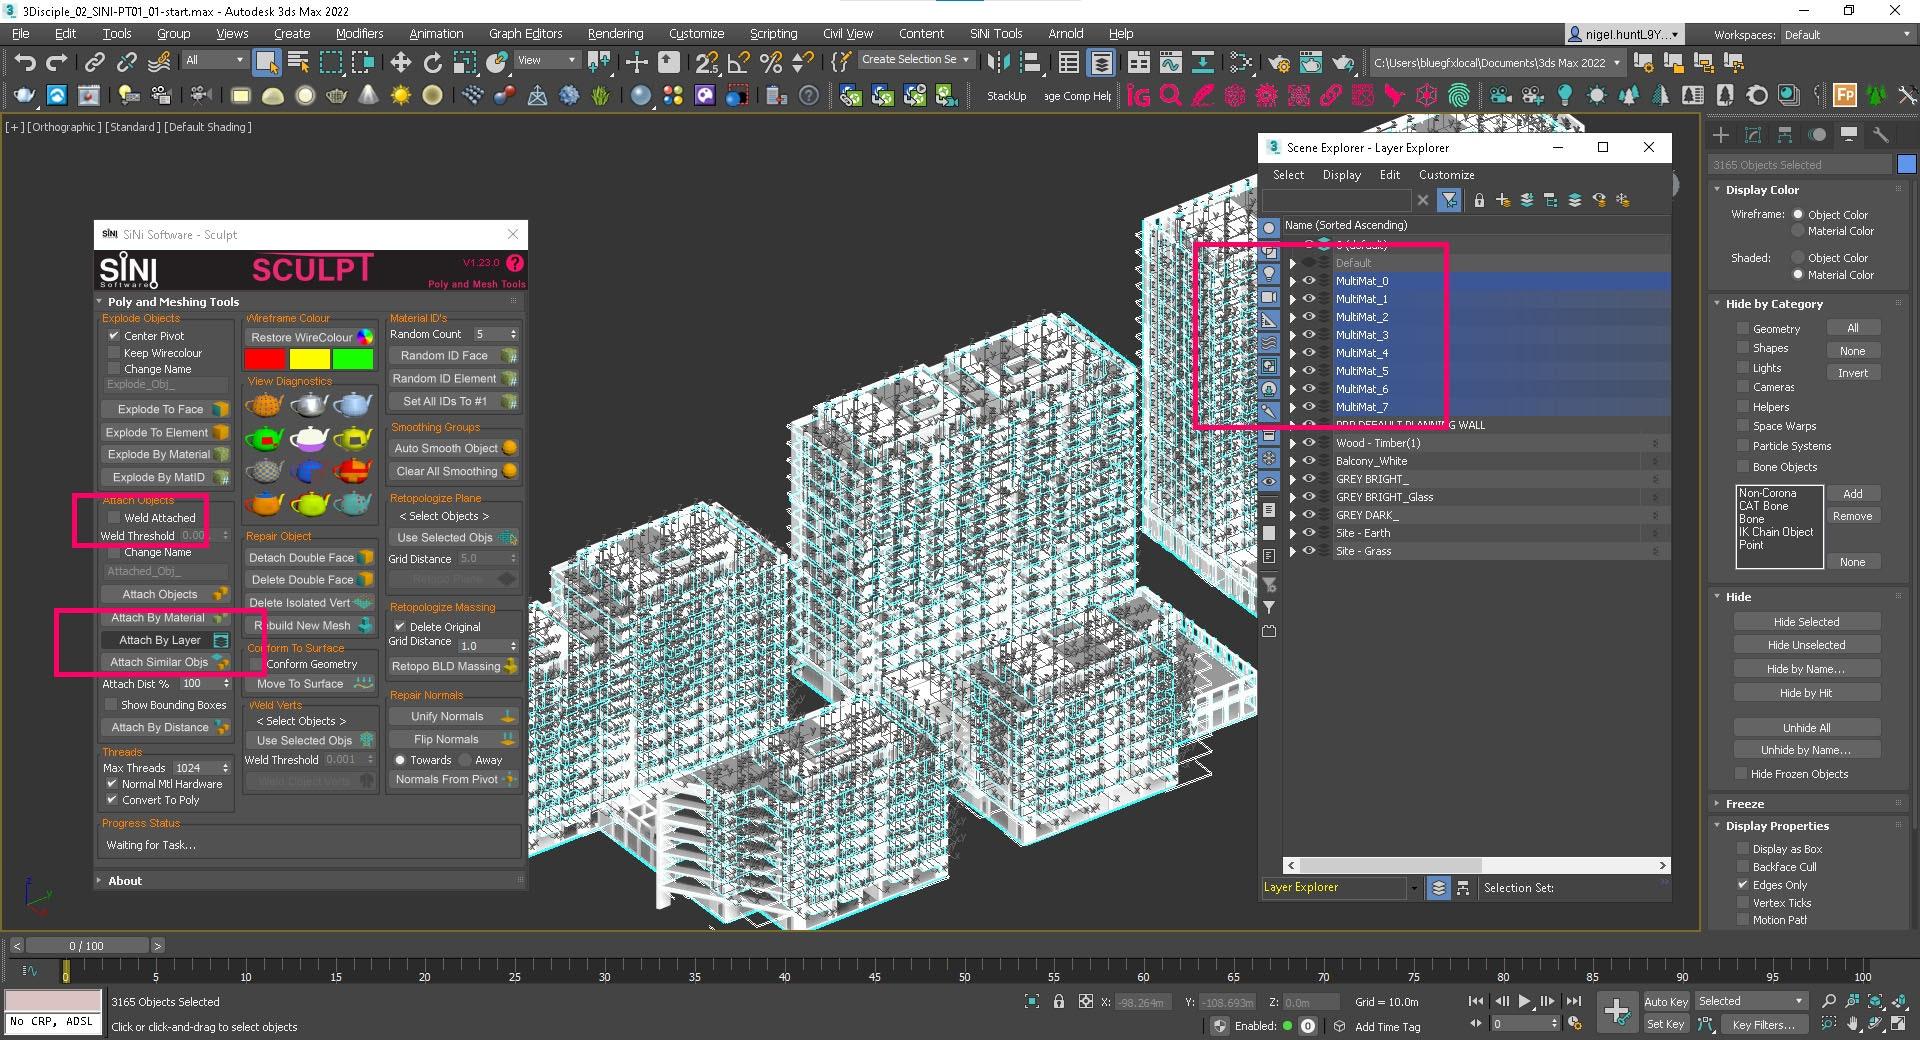 Screenshot of Sculpt - Attach by Layers.